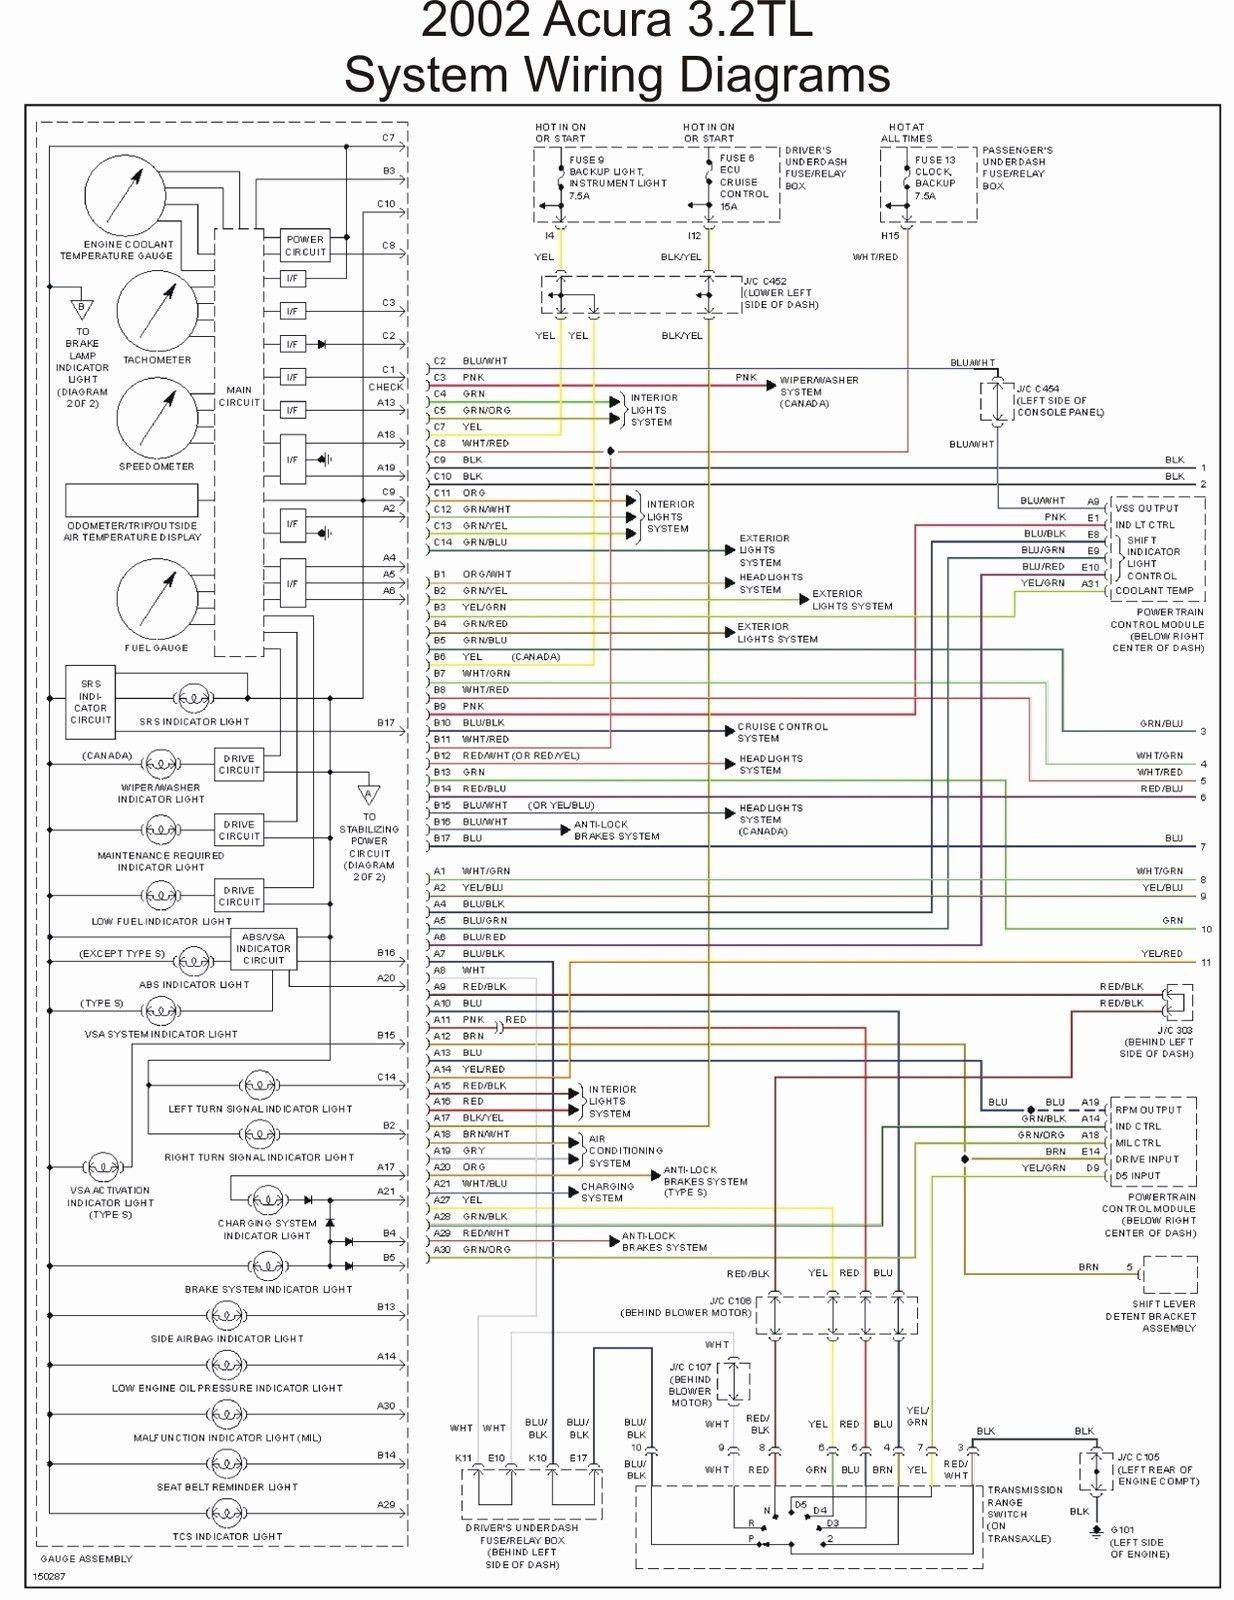 2000 Honda Civic Radio Wiring Diagram : honda, civic, radio, wiring, diagram, Honda, Wiring, Diagram, Symbols, Bookingritzcarlton.info, Civic,, Diagram,